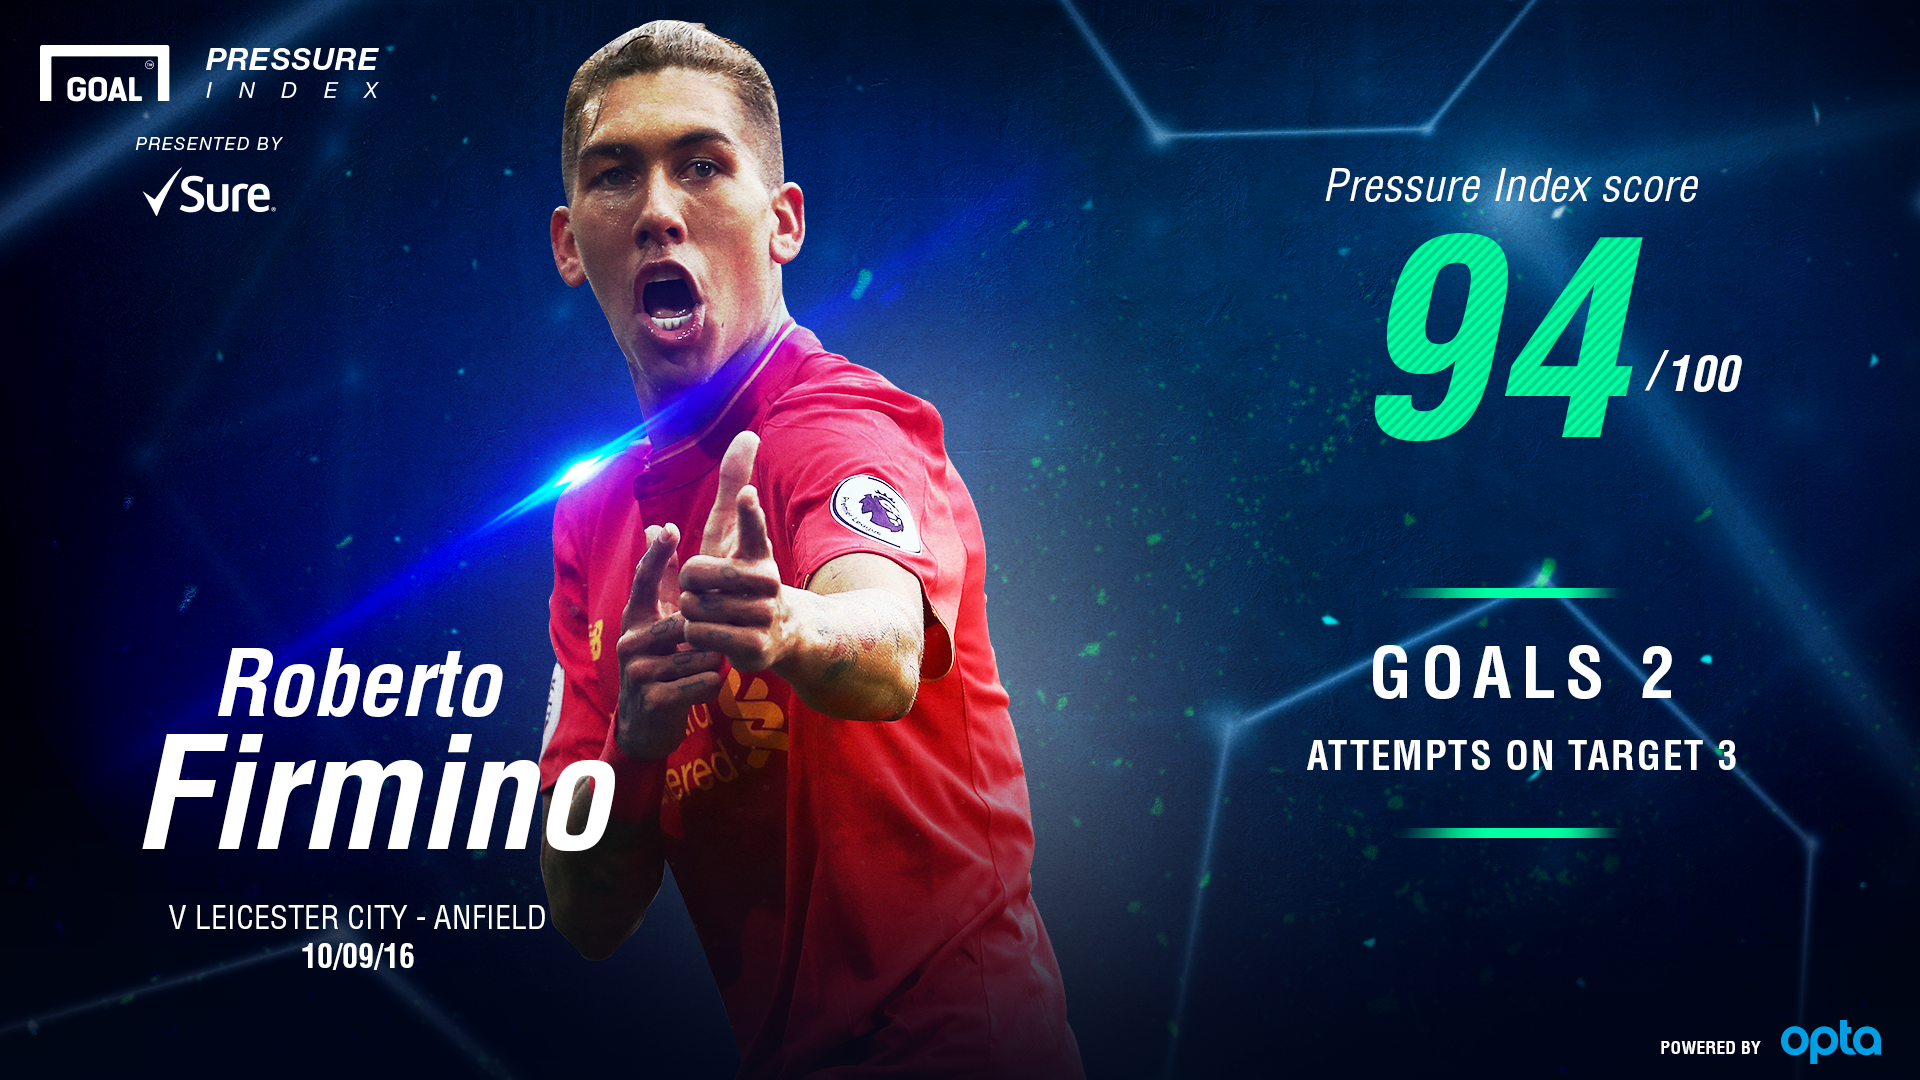 Roberto Firmino Sure Pressure Index